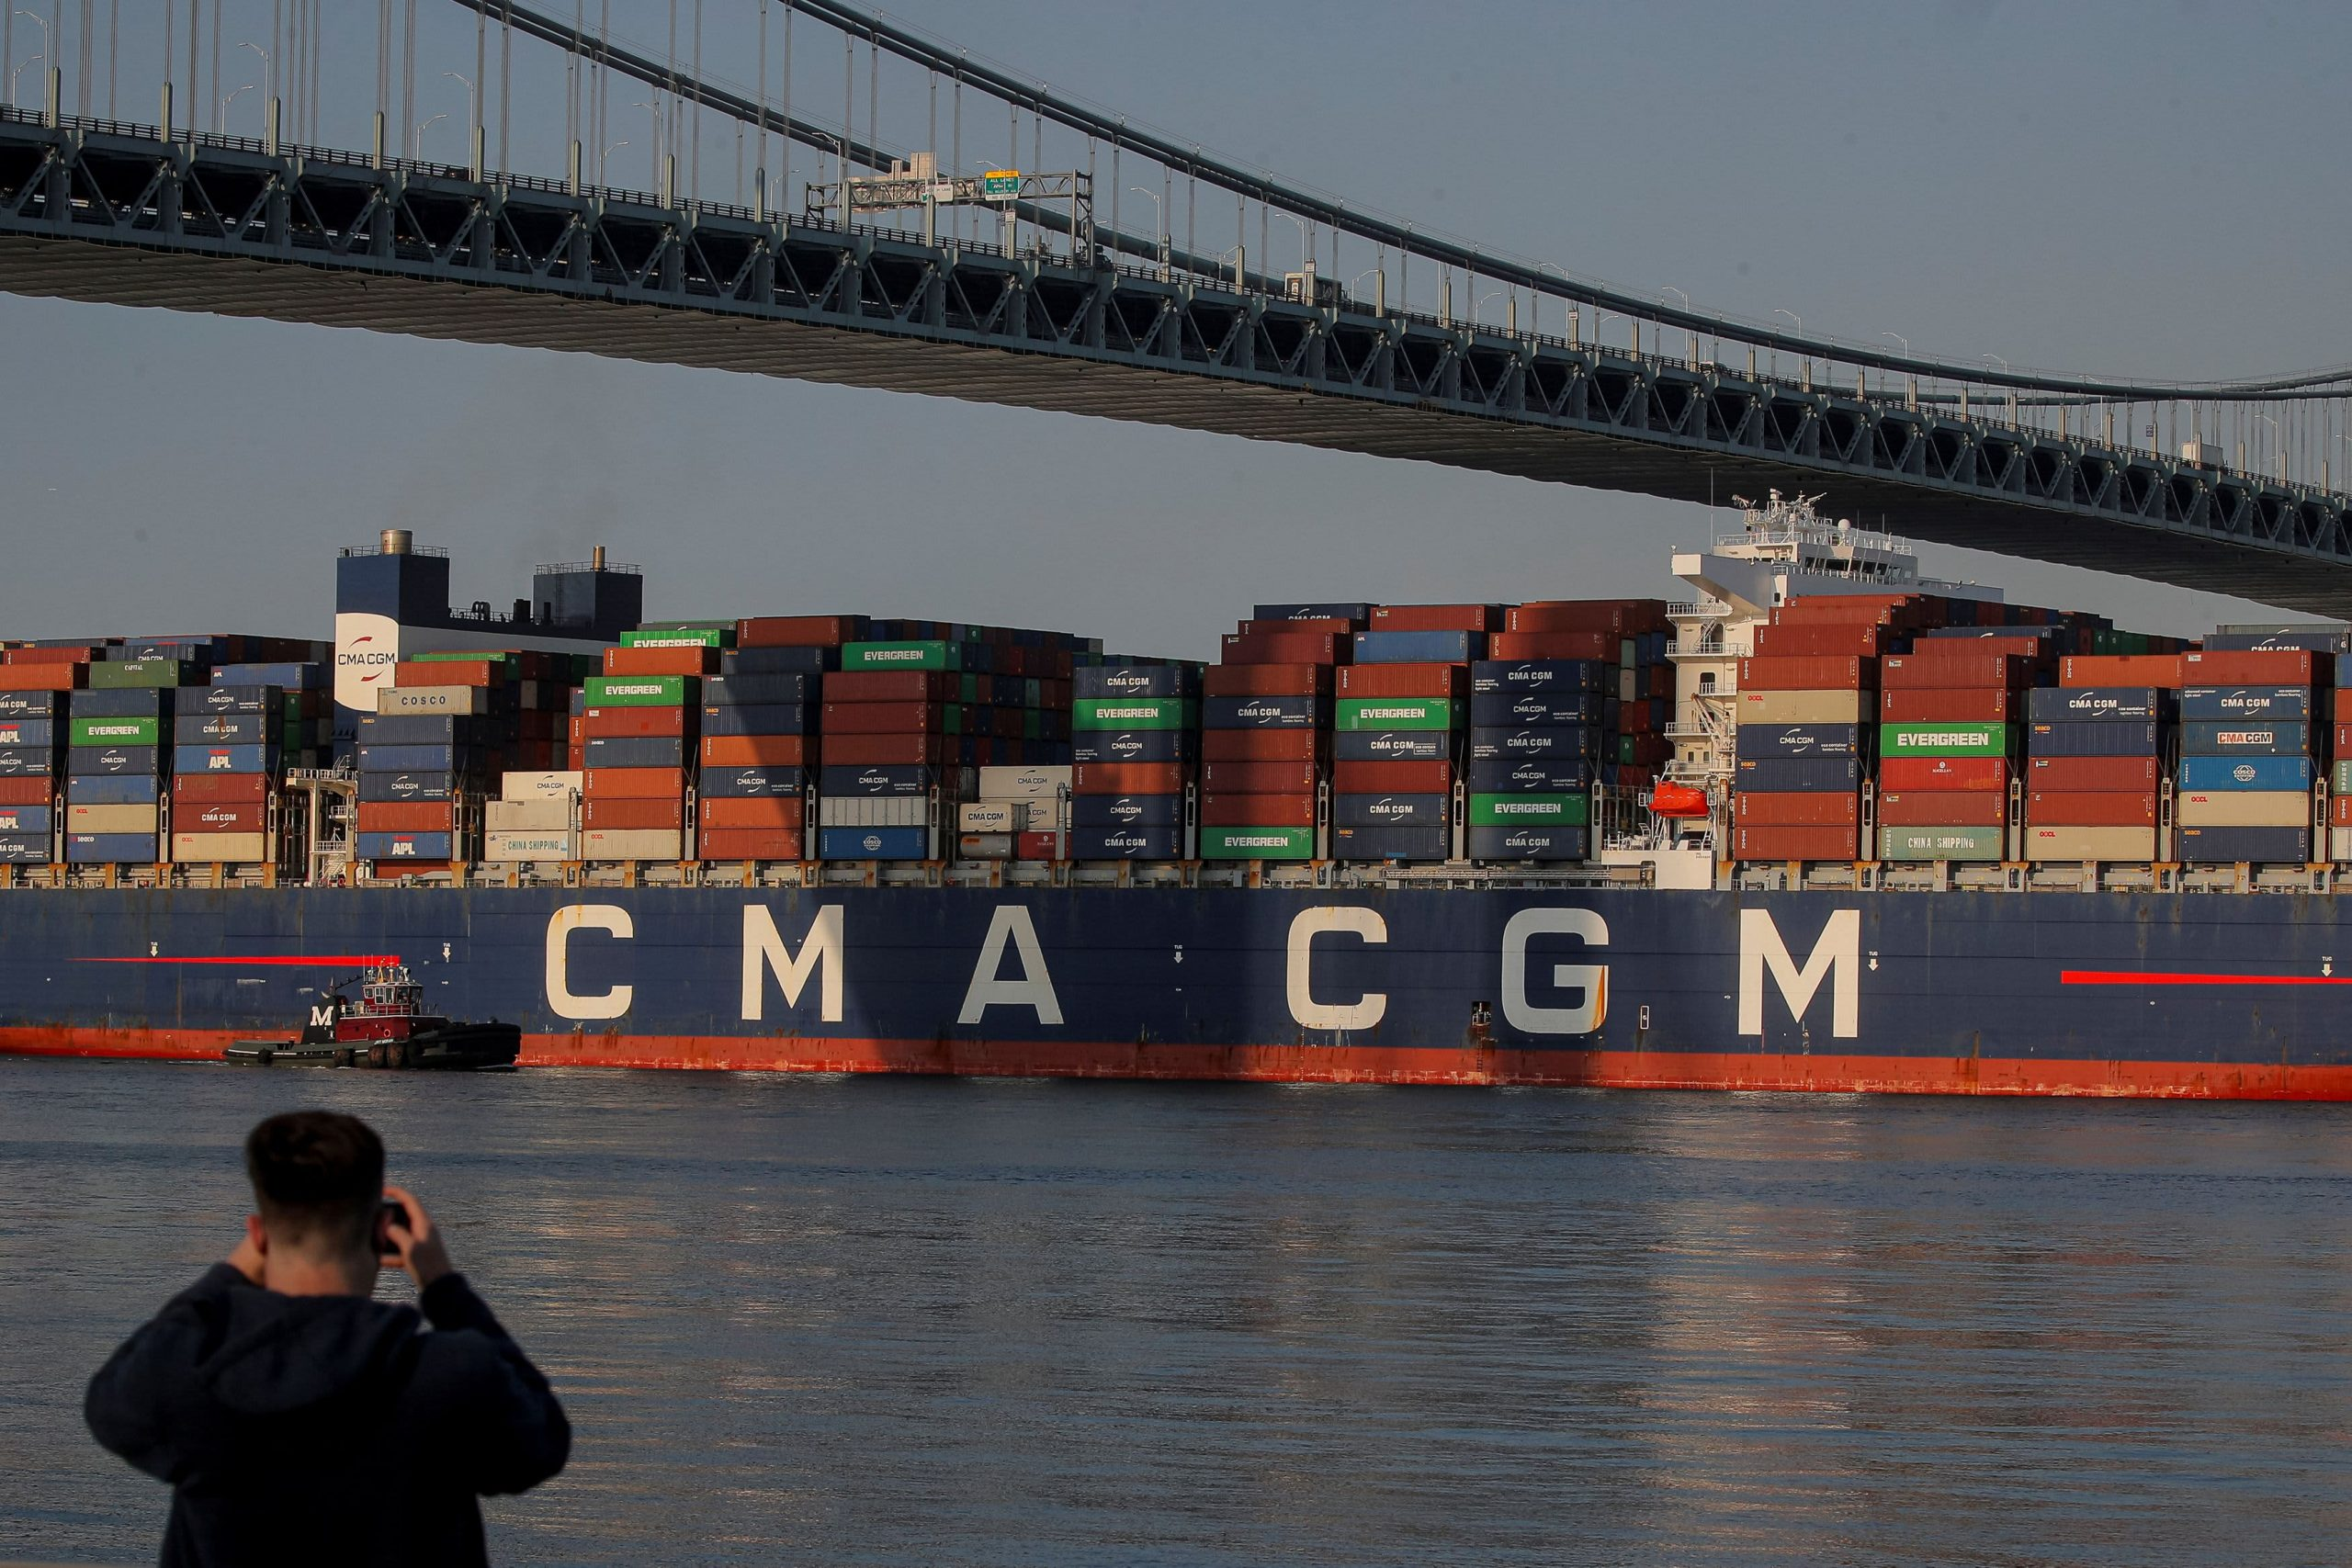 El déficit comercial de EE. UU. Se reduce ligeramente desde niveles récord a medida que la demanda de importaciones de la era Covid disminuye